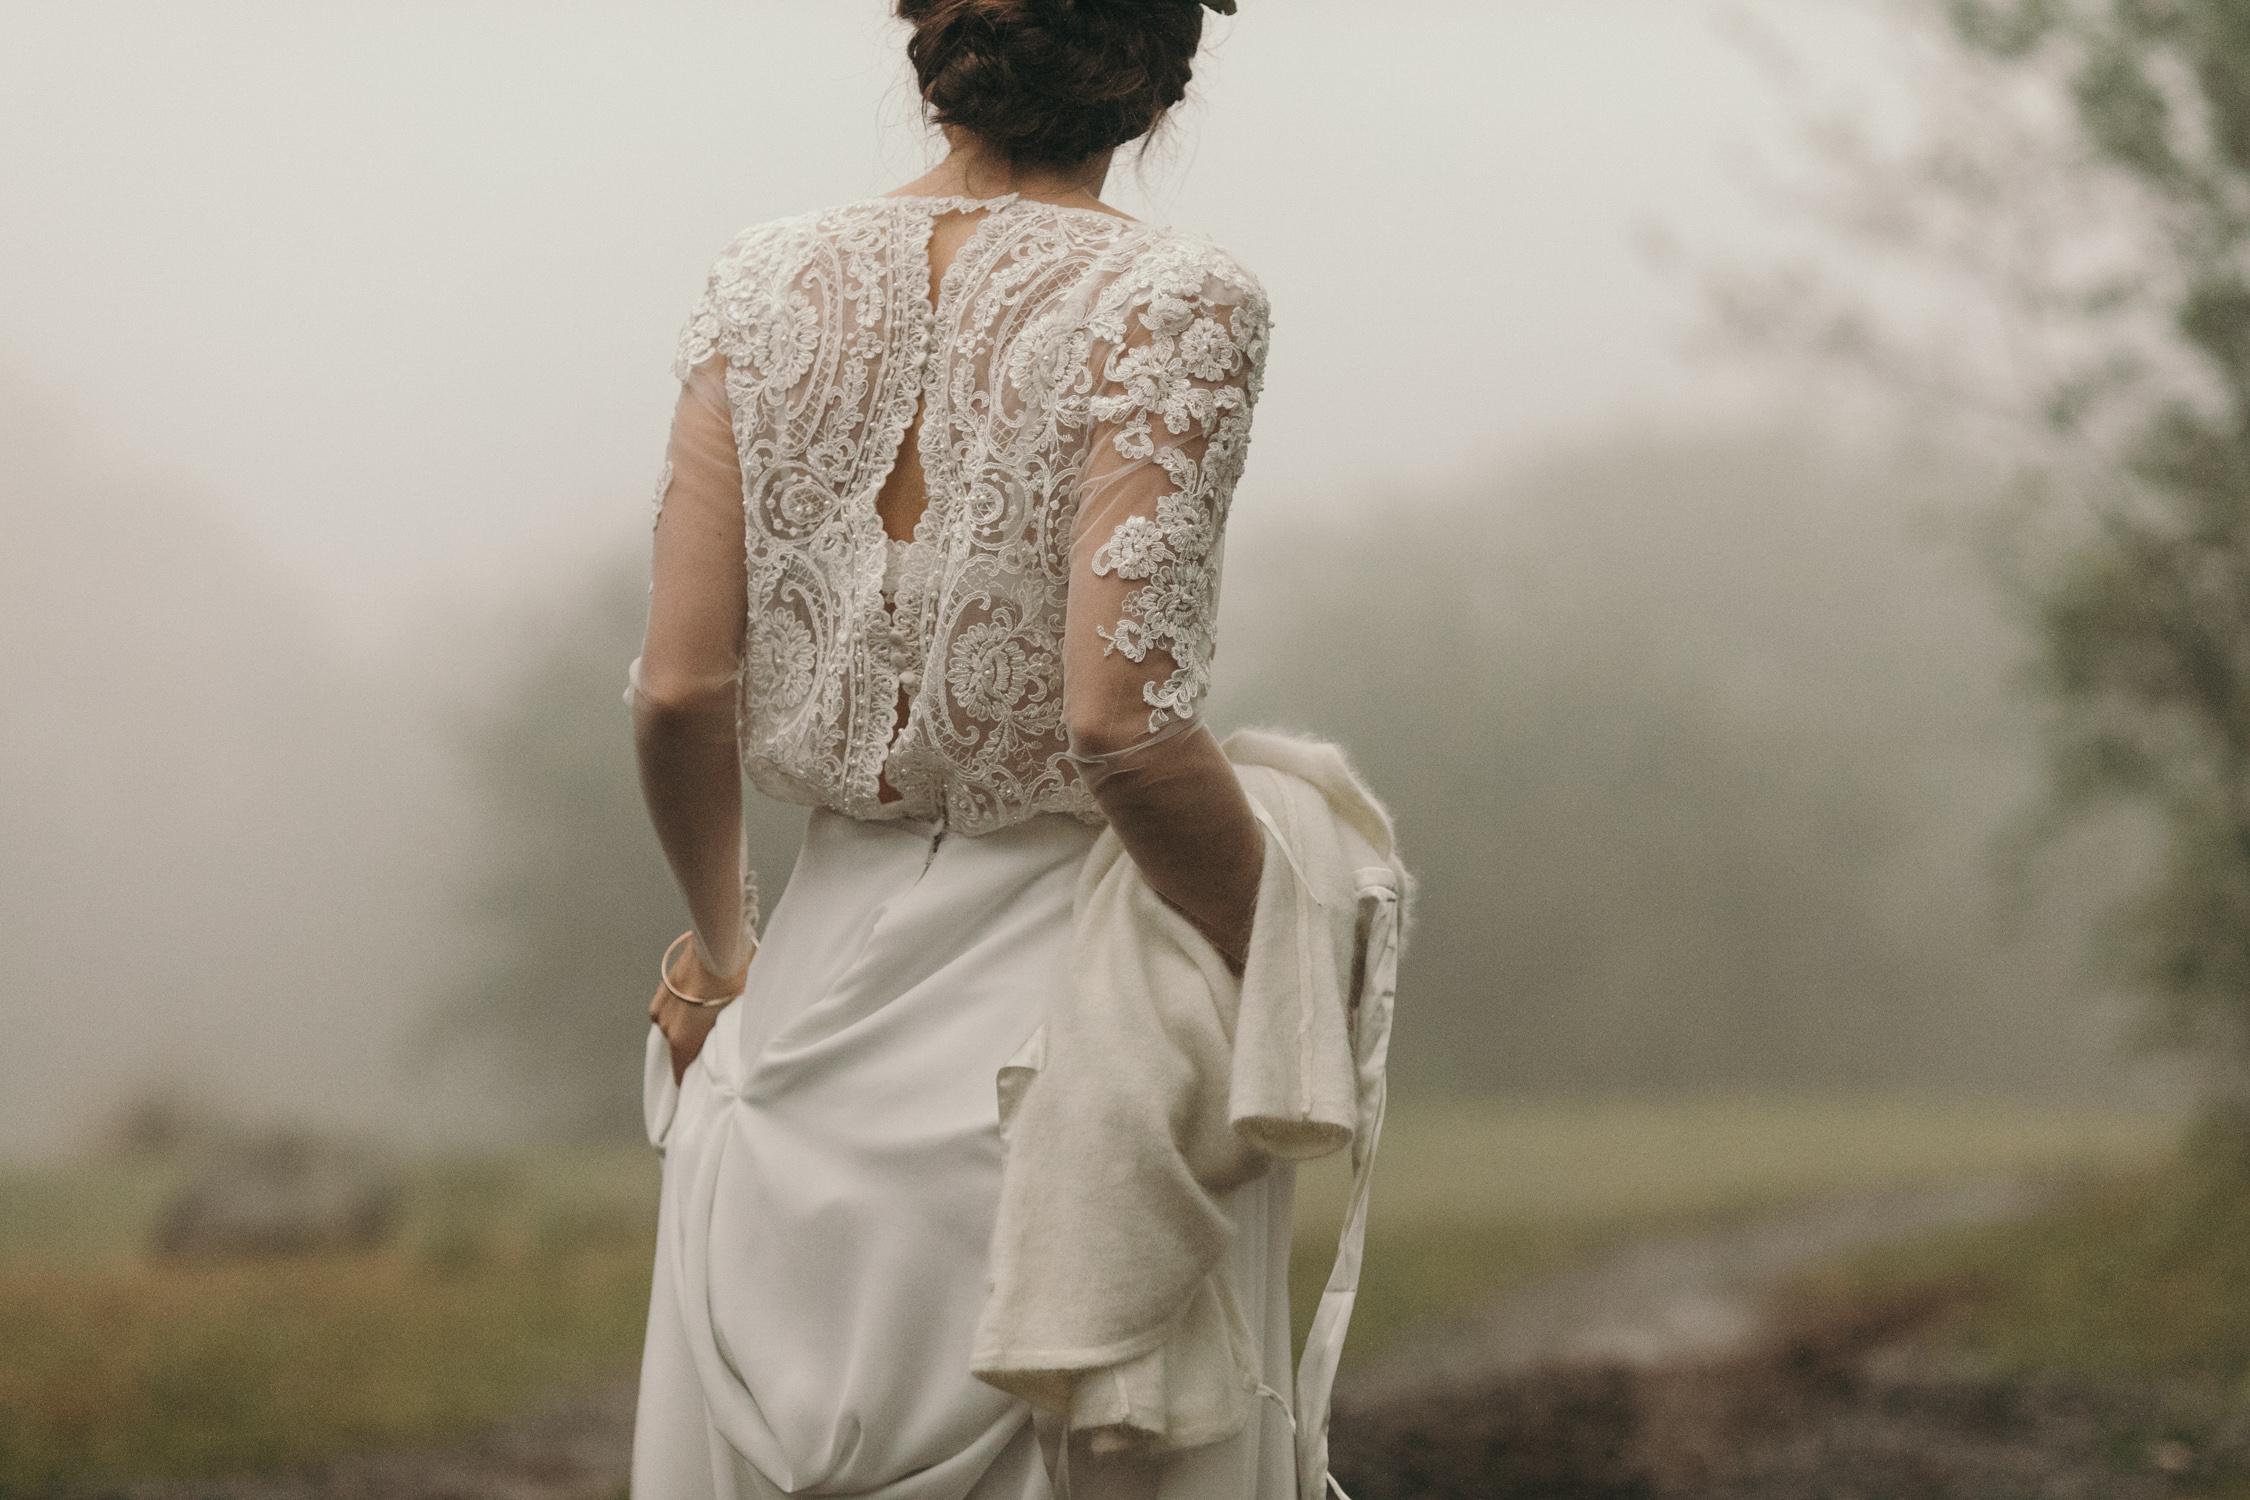 heisvisual-wedding-photographers-documentary-midlands-south-africa087.jpg